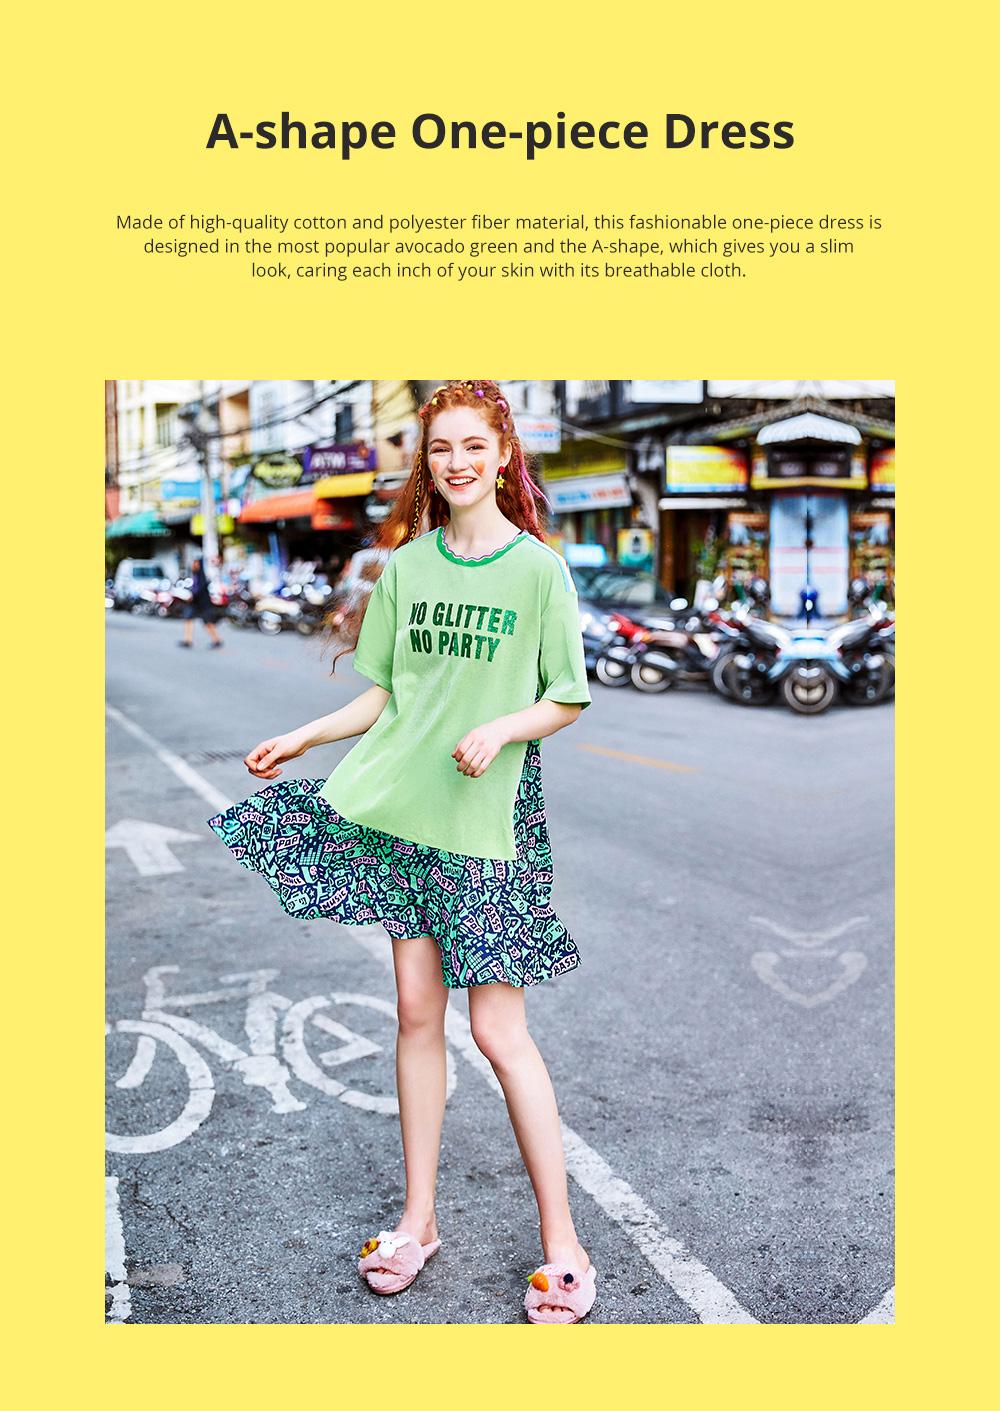 Summer New European Style Fashionable Avocado Green One-piece Fresh Leisure A-shape Dress For Girls Womens 0